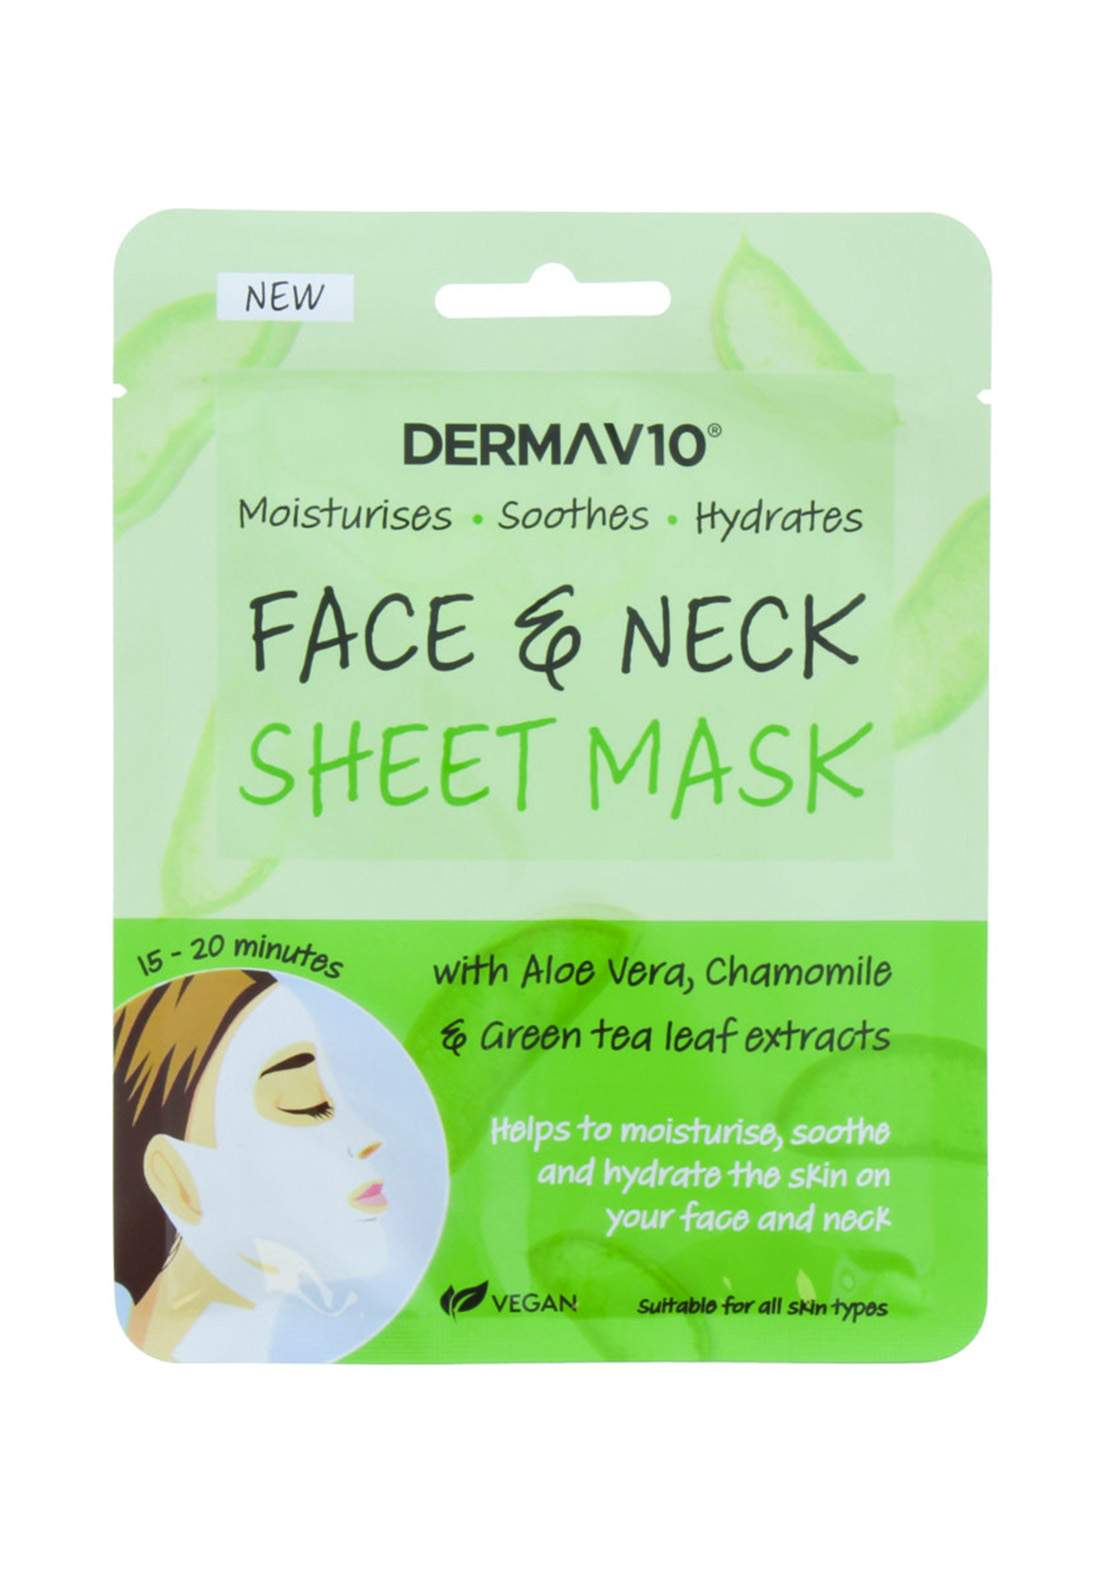 Dermav10 (17847fnav) Aloe Vera Chamomile Face & Neck Sheet Mask ماسك ورقي